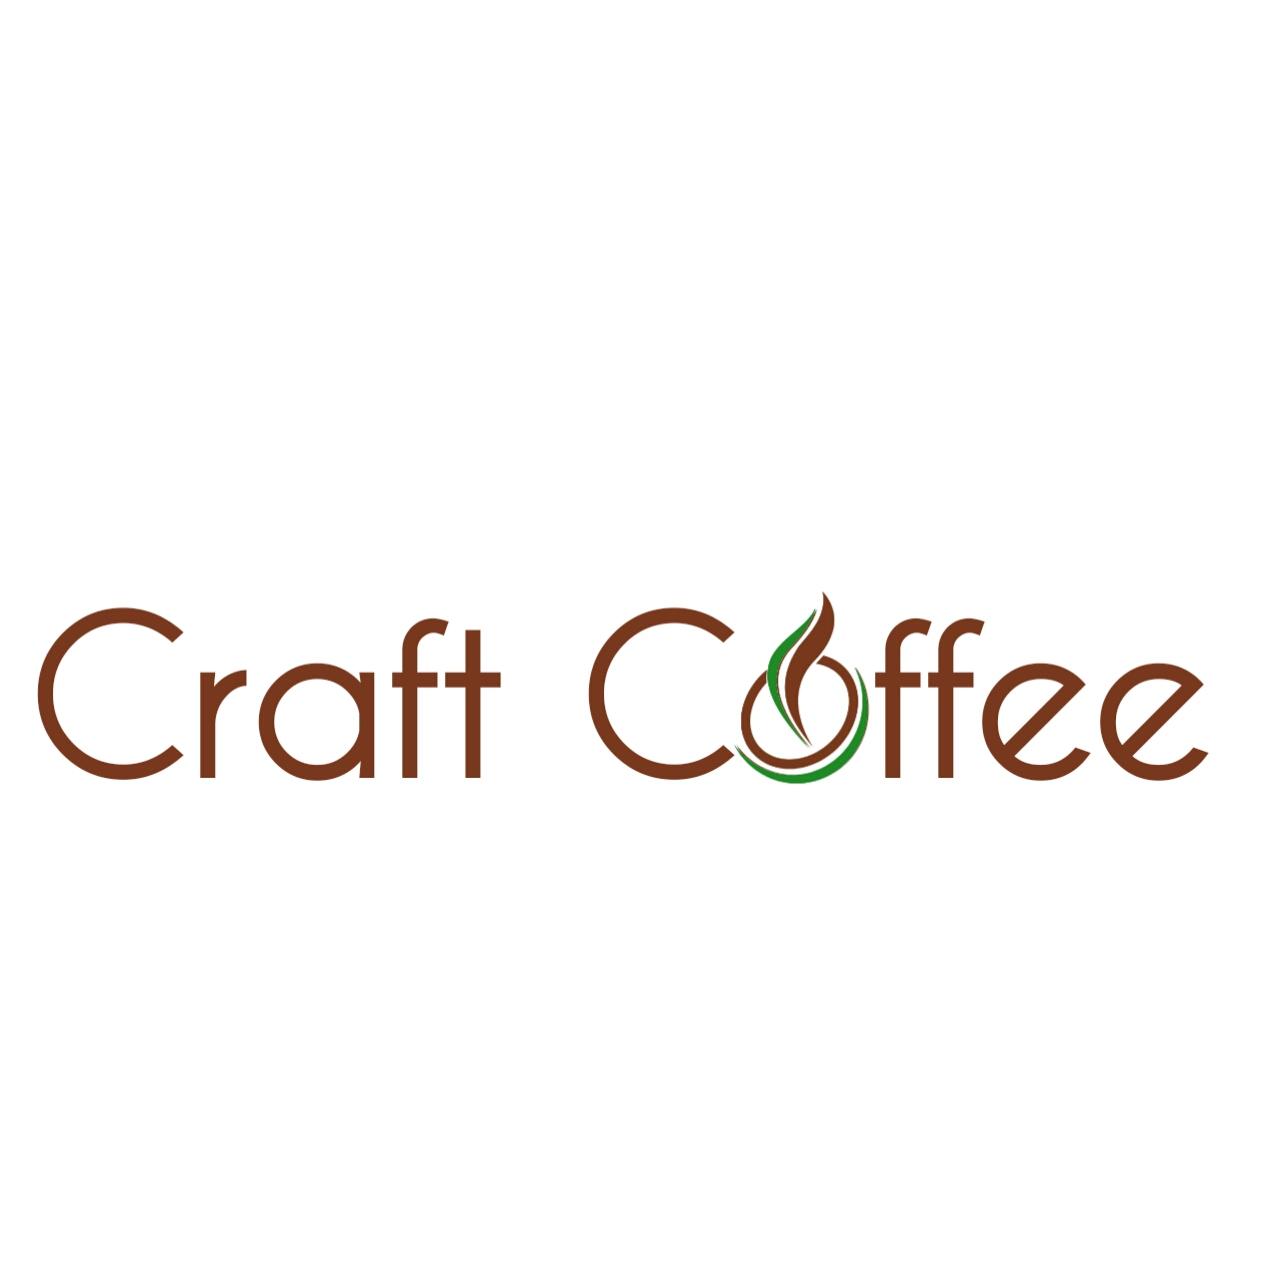 Логотип и фирменный стиль для компании COFFEE CULT фото f_1175bbb300ed6ae1.jpg